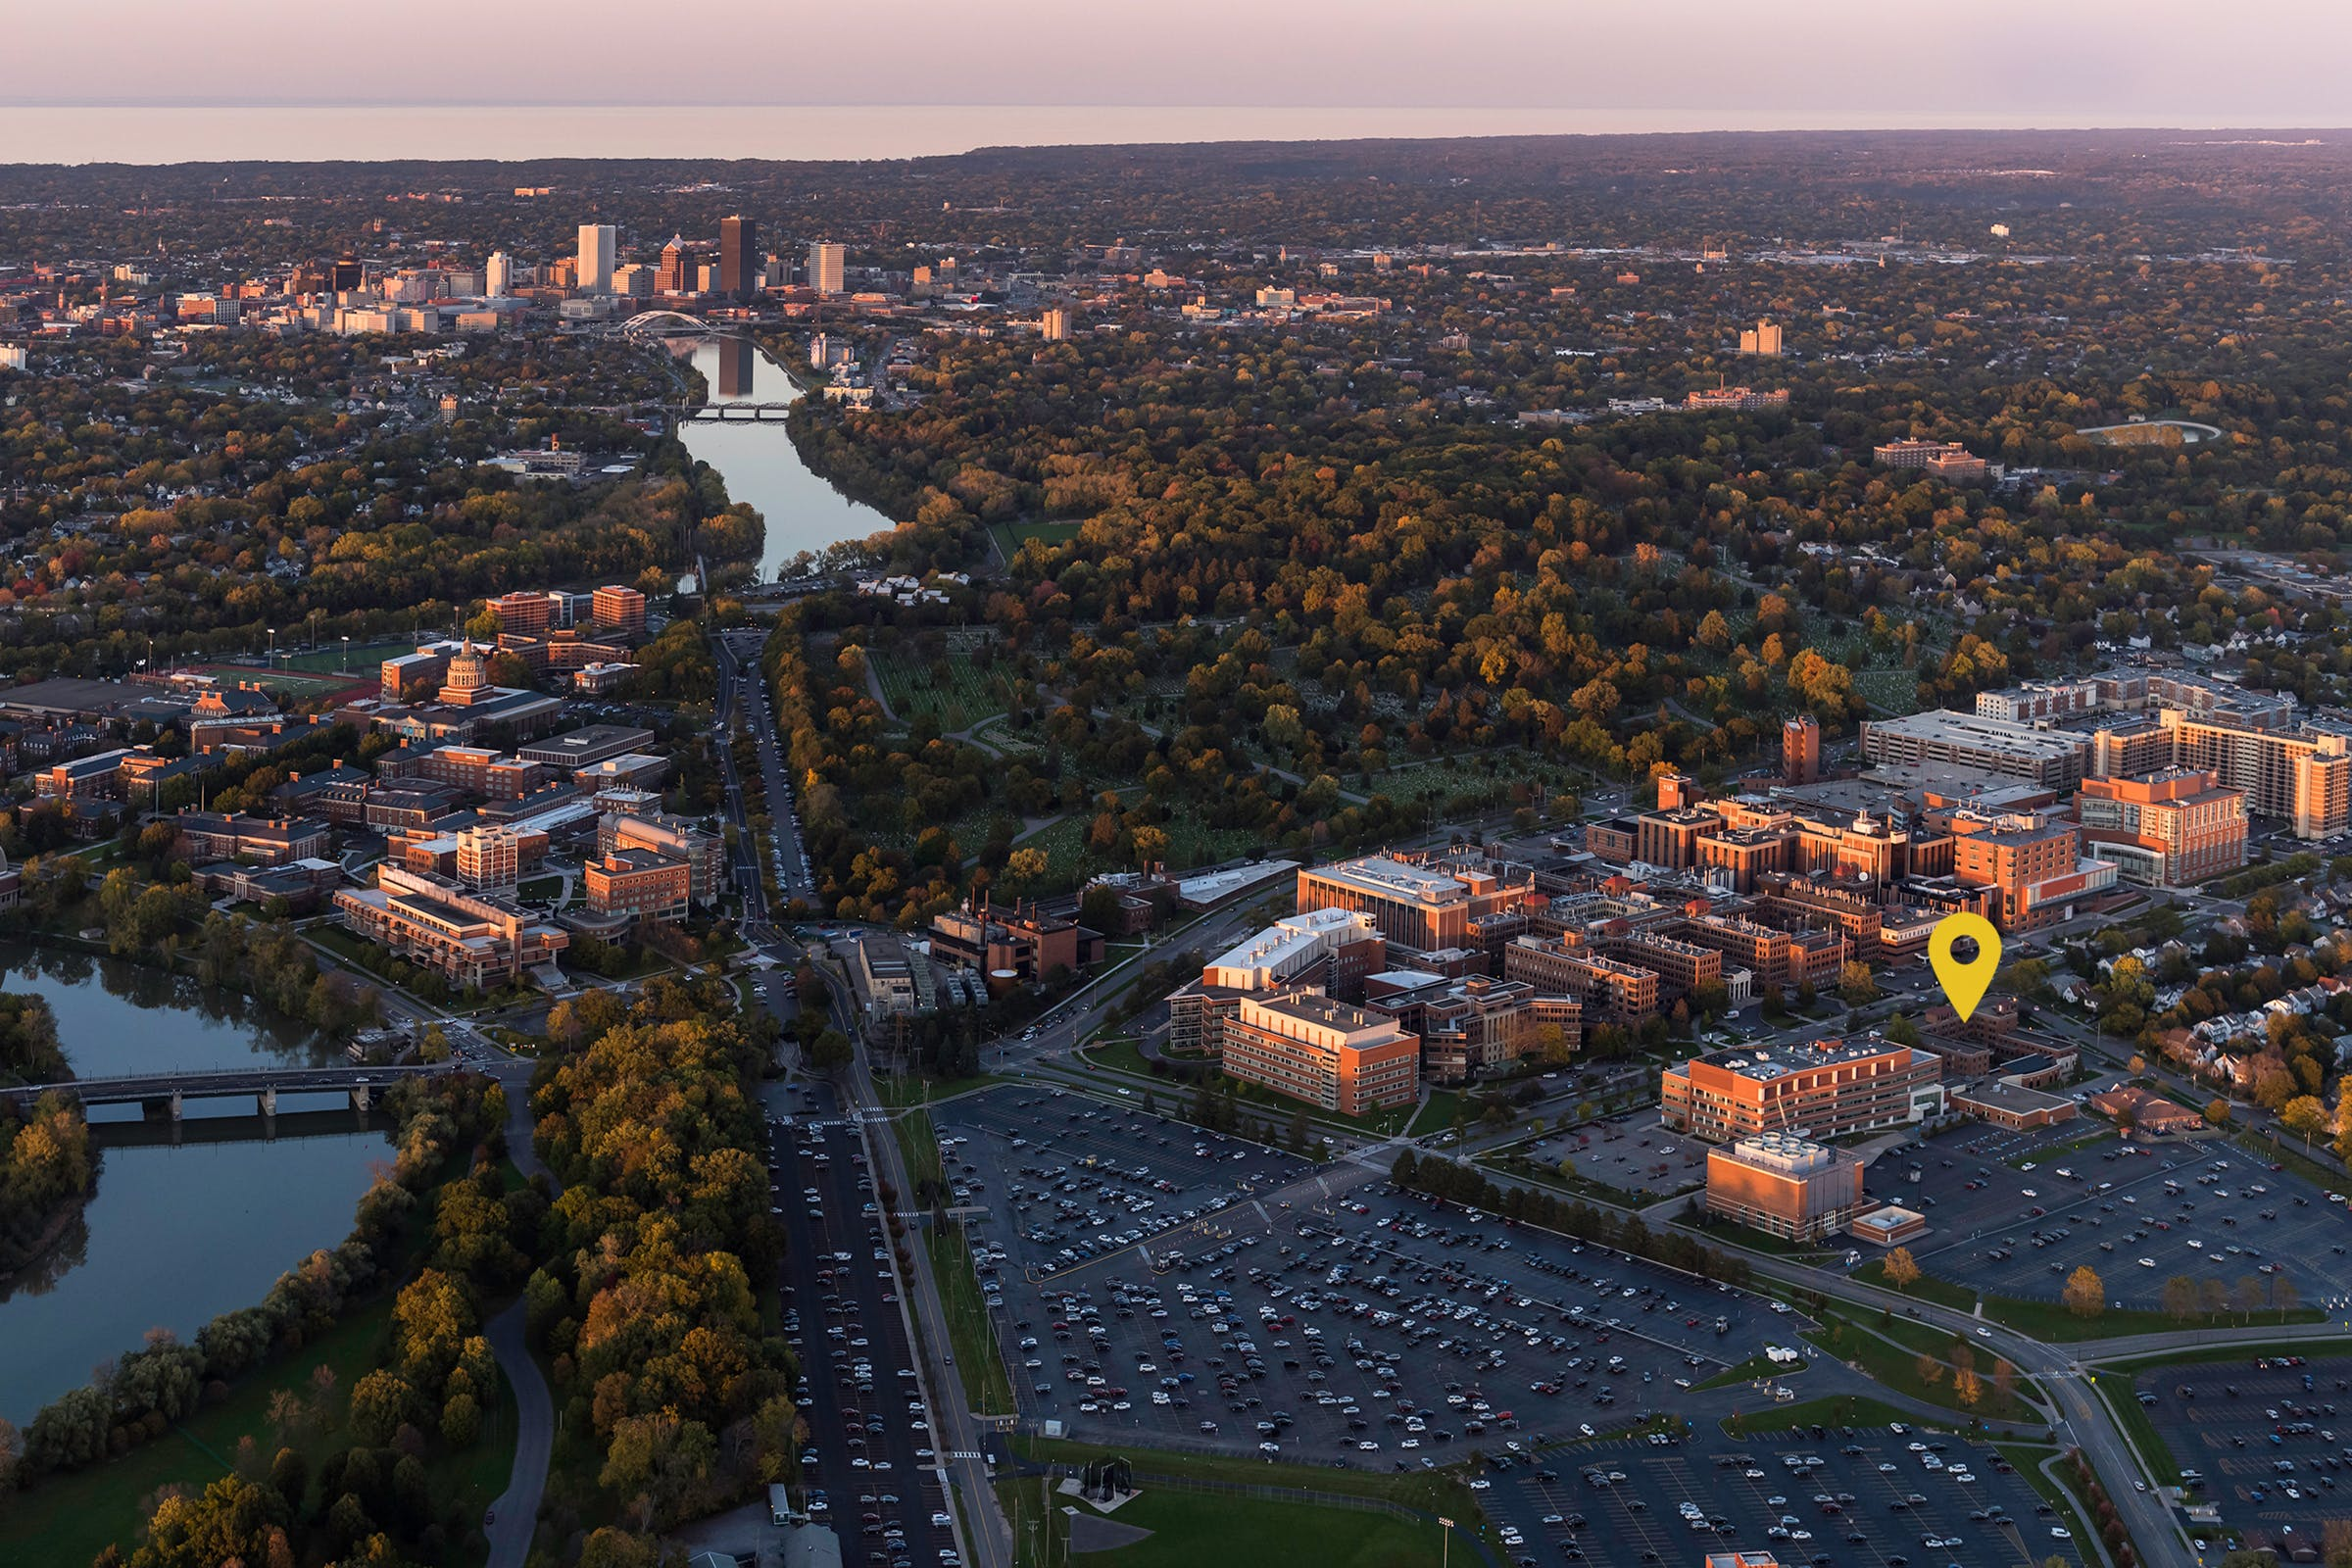 Aerial view University